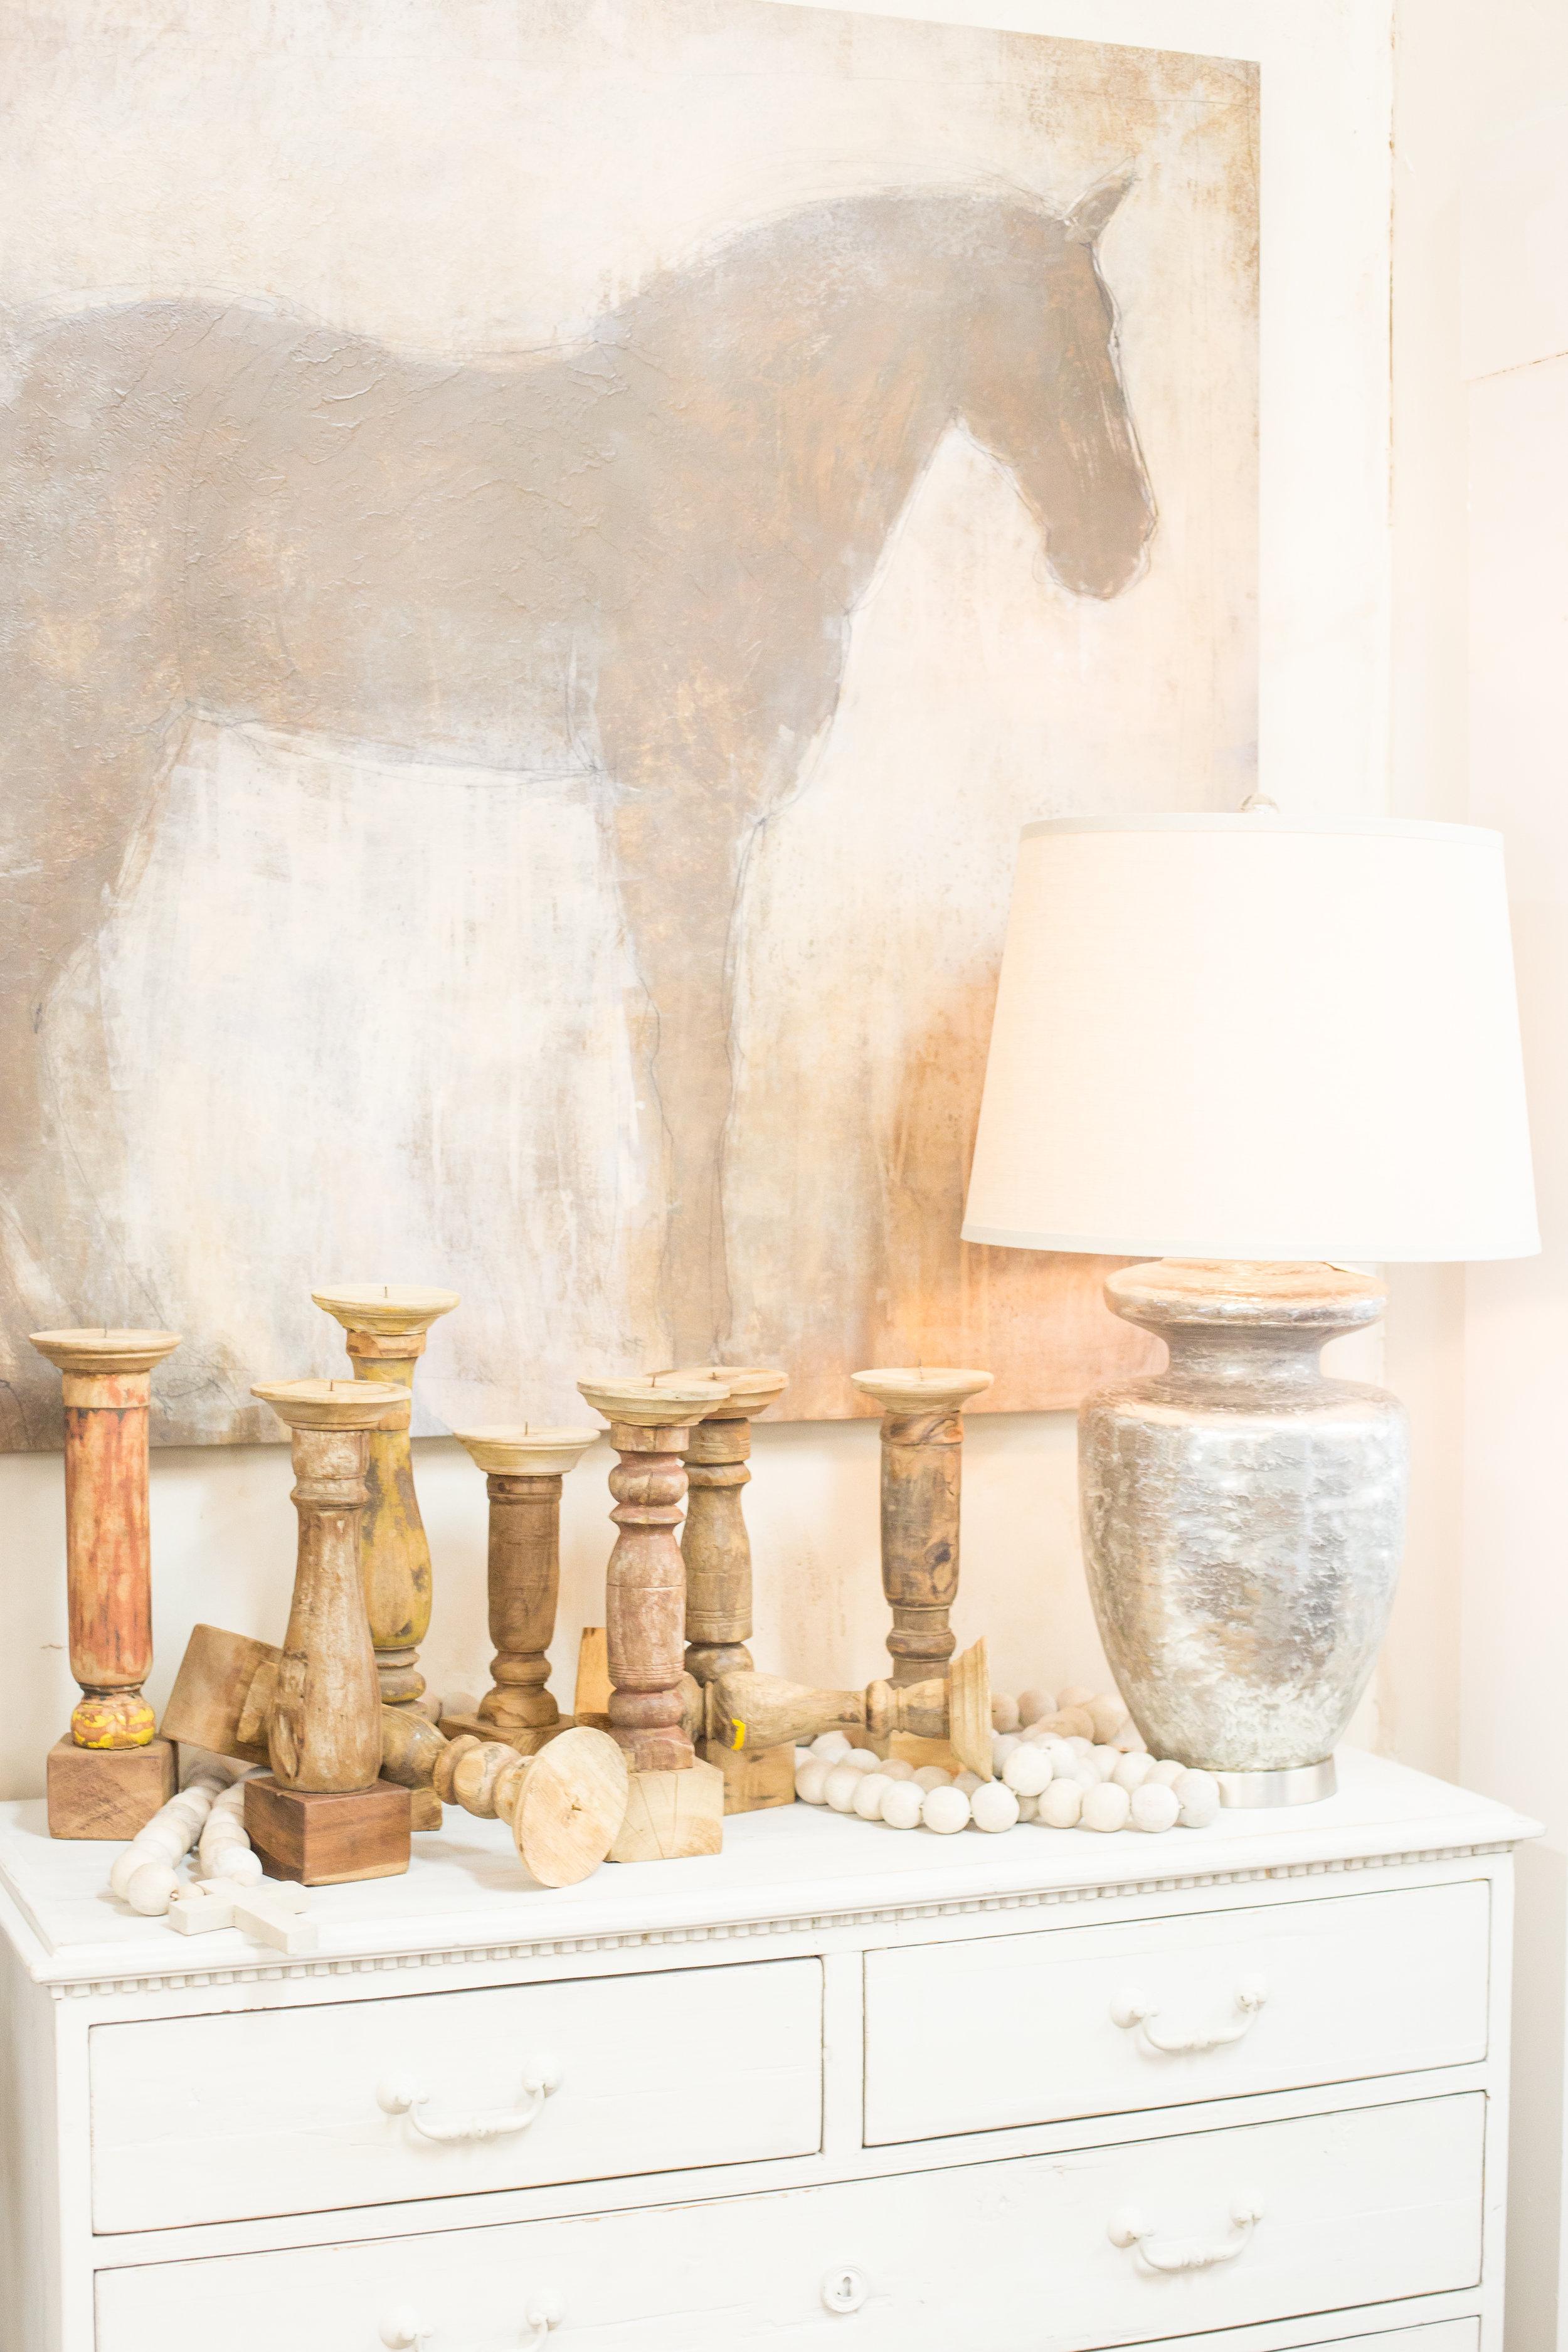 Wood decor, lamp